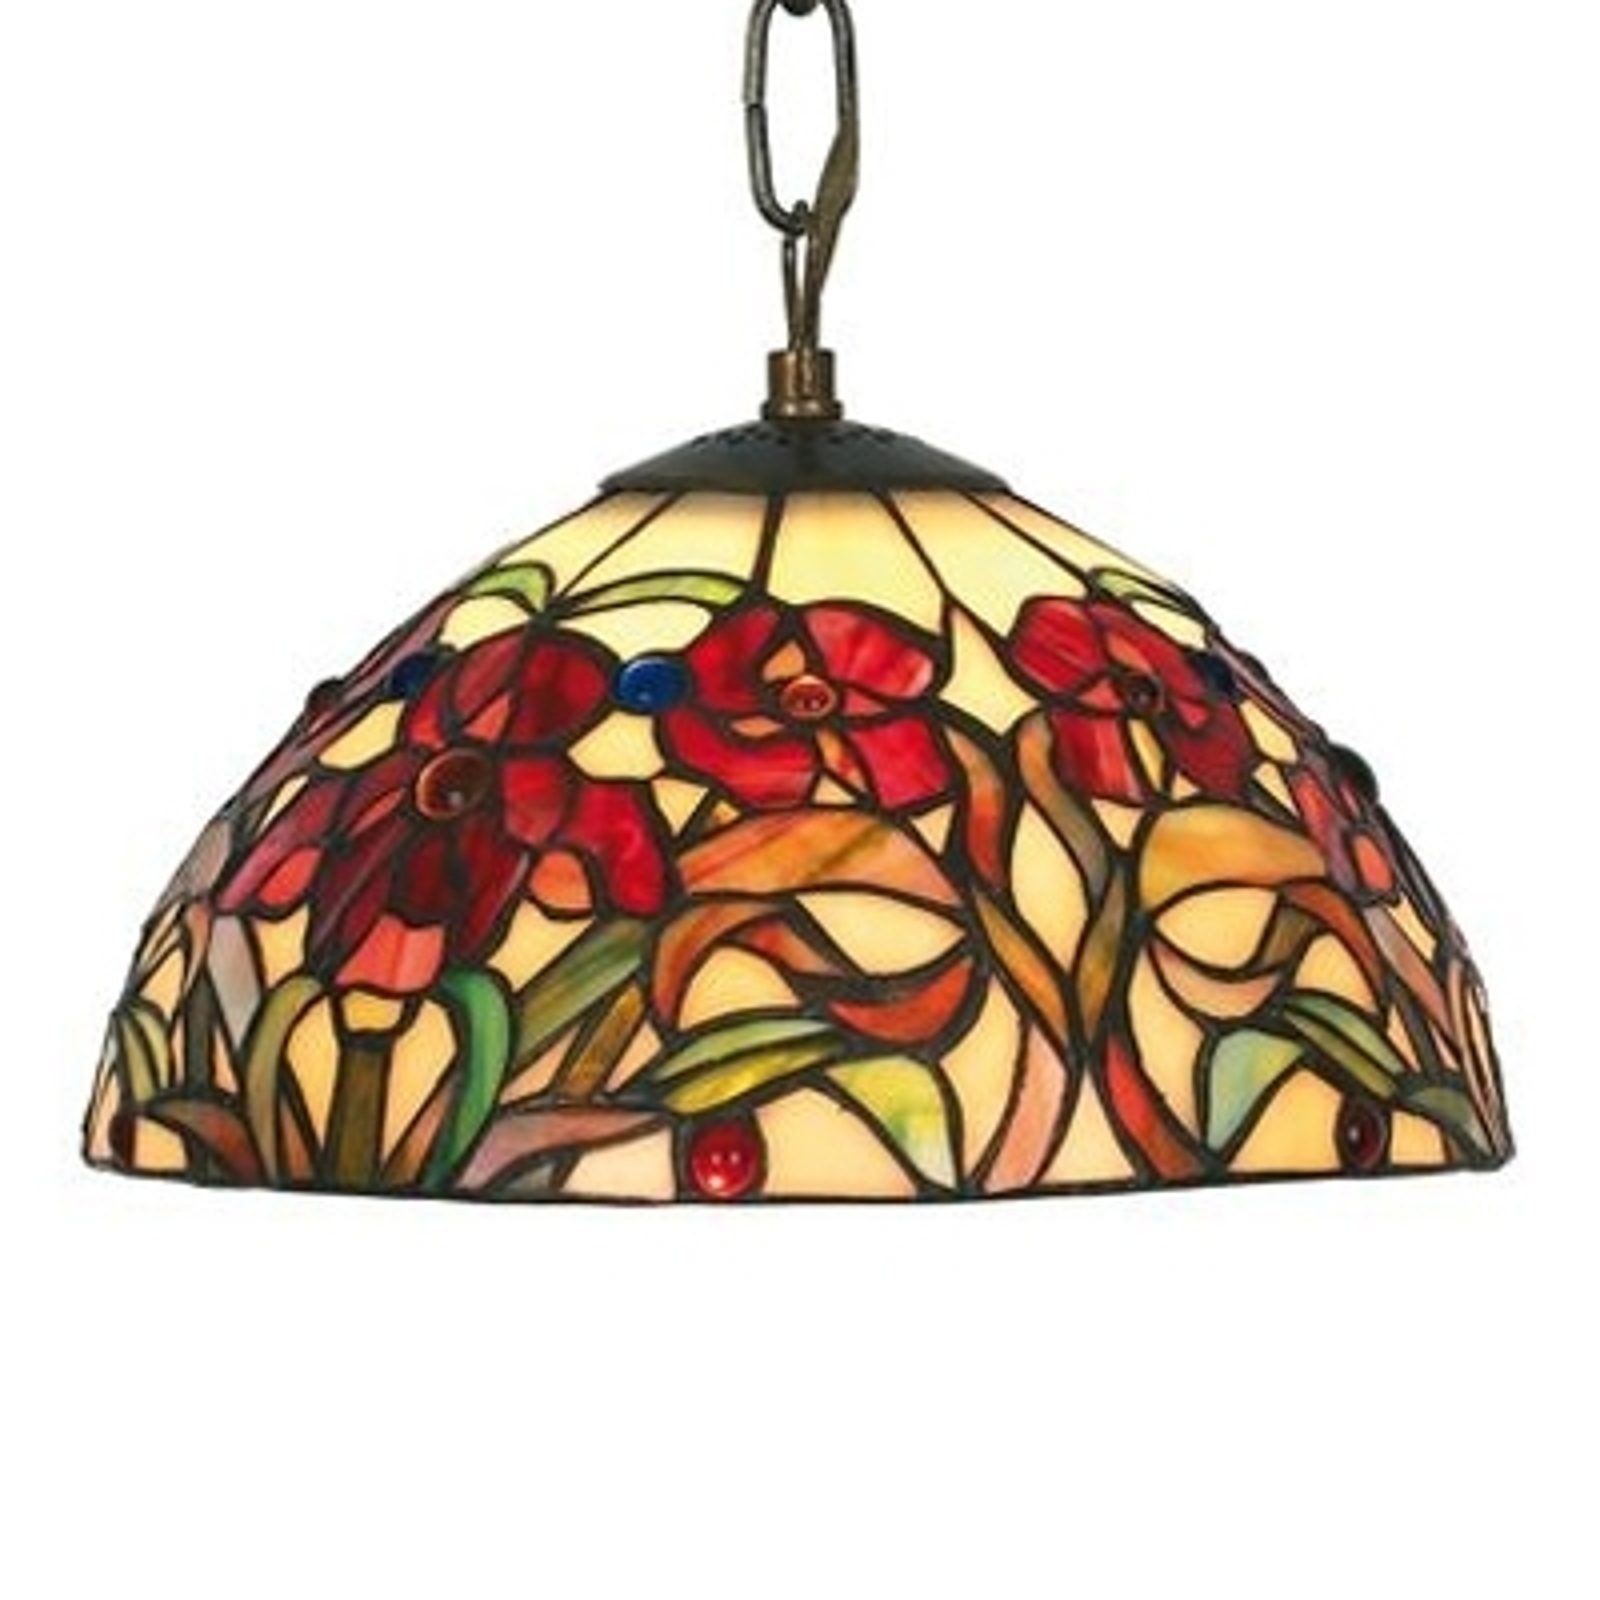 Kleine hanglamp Eline in Tiffany-stijl